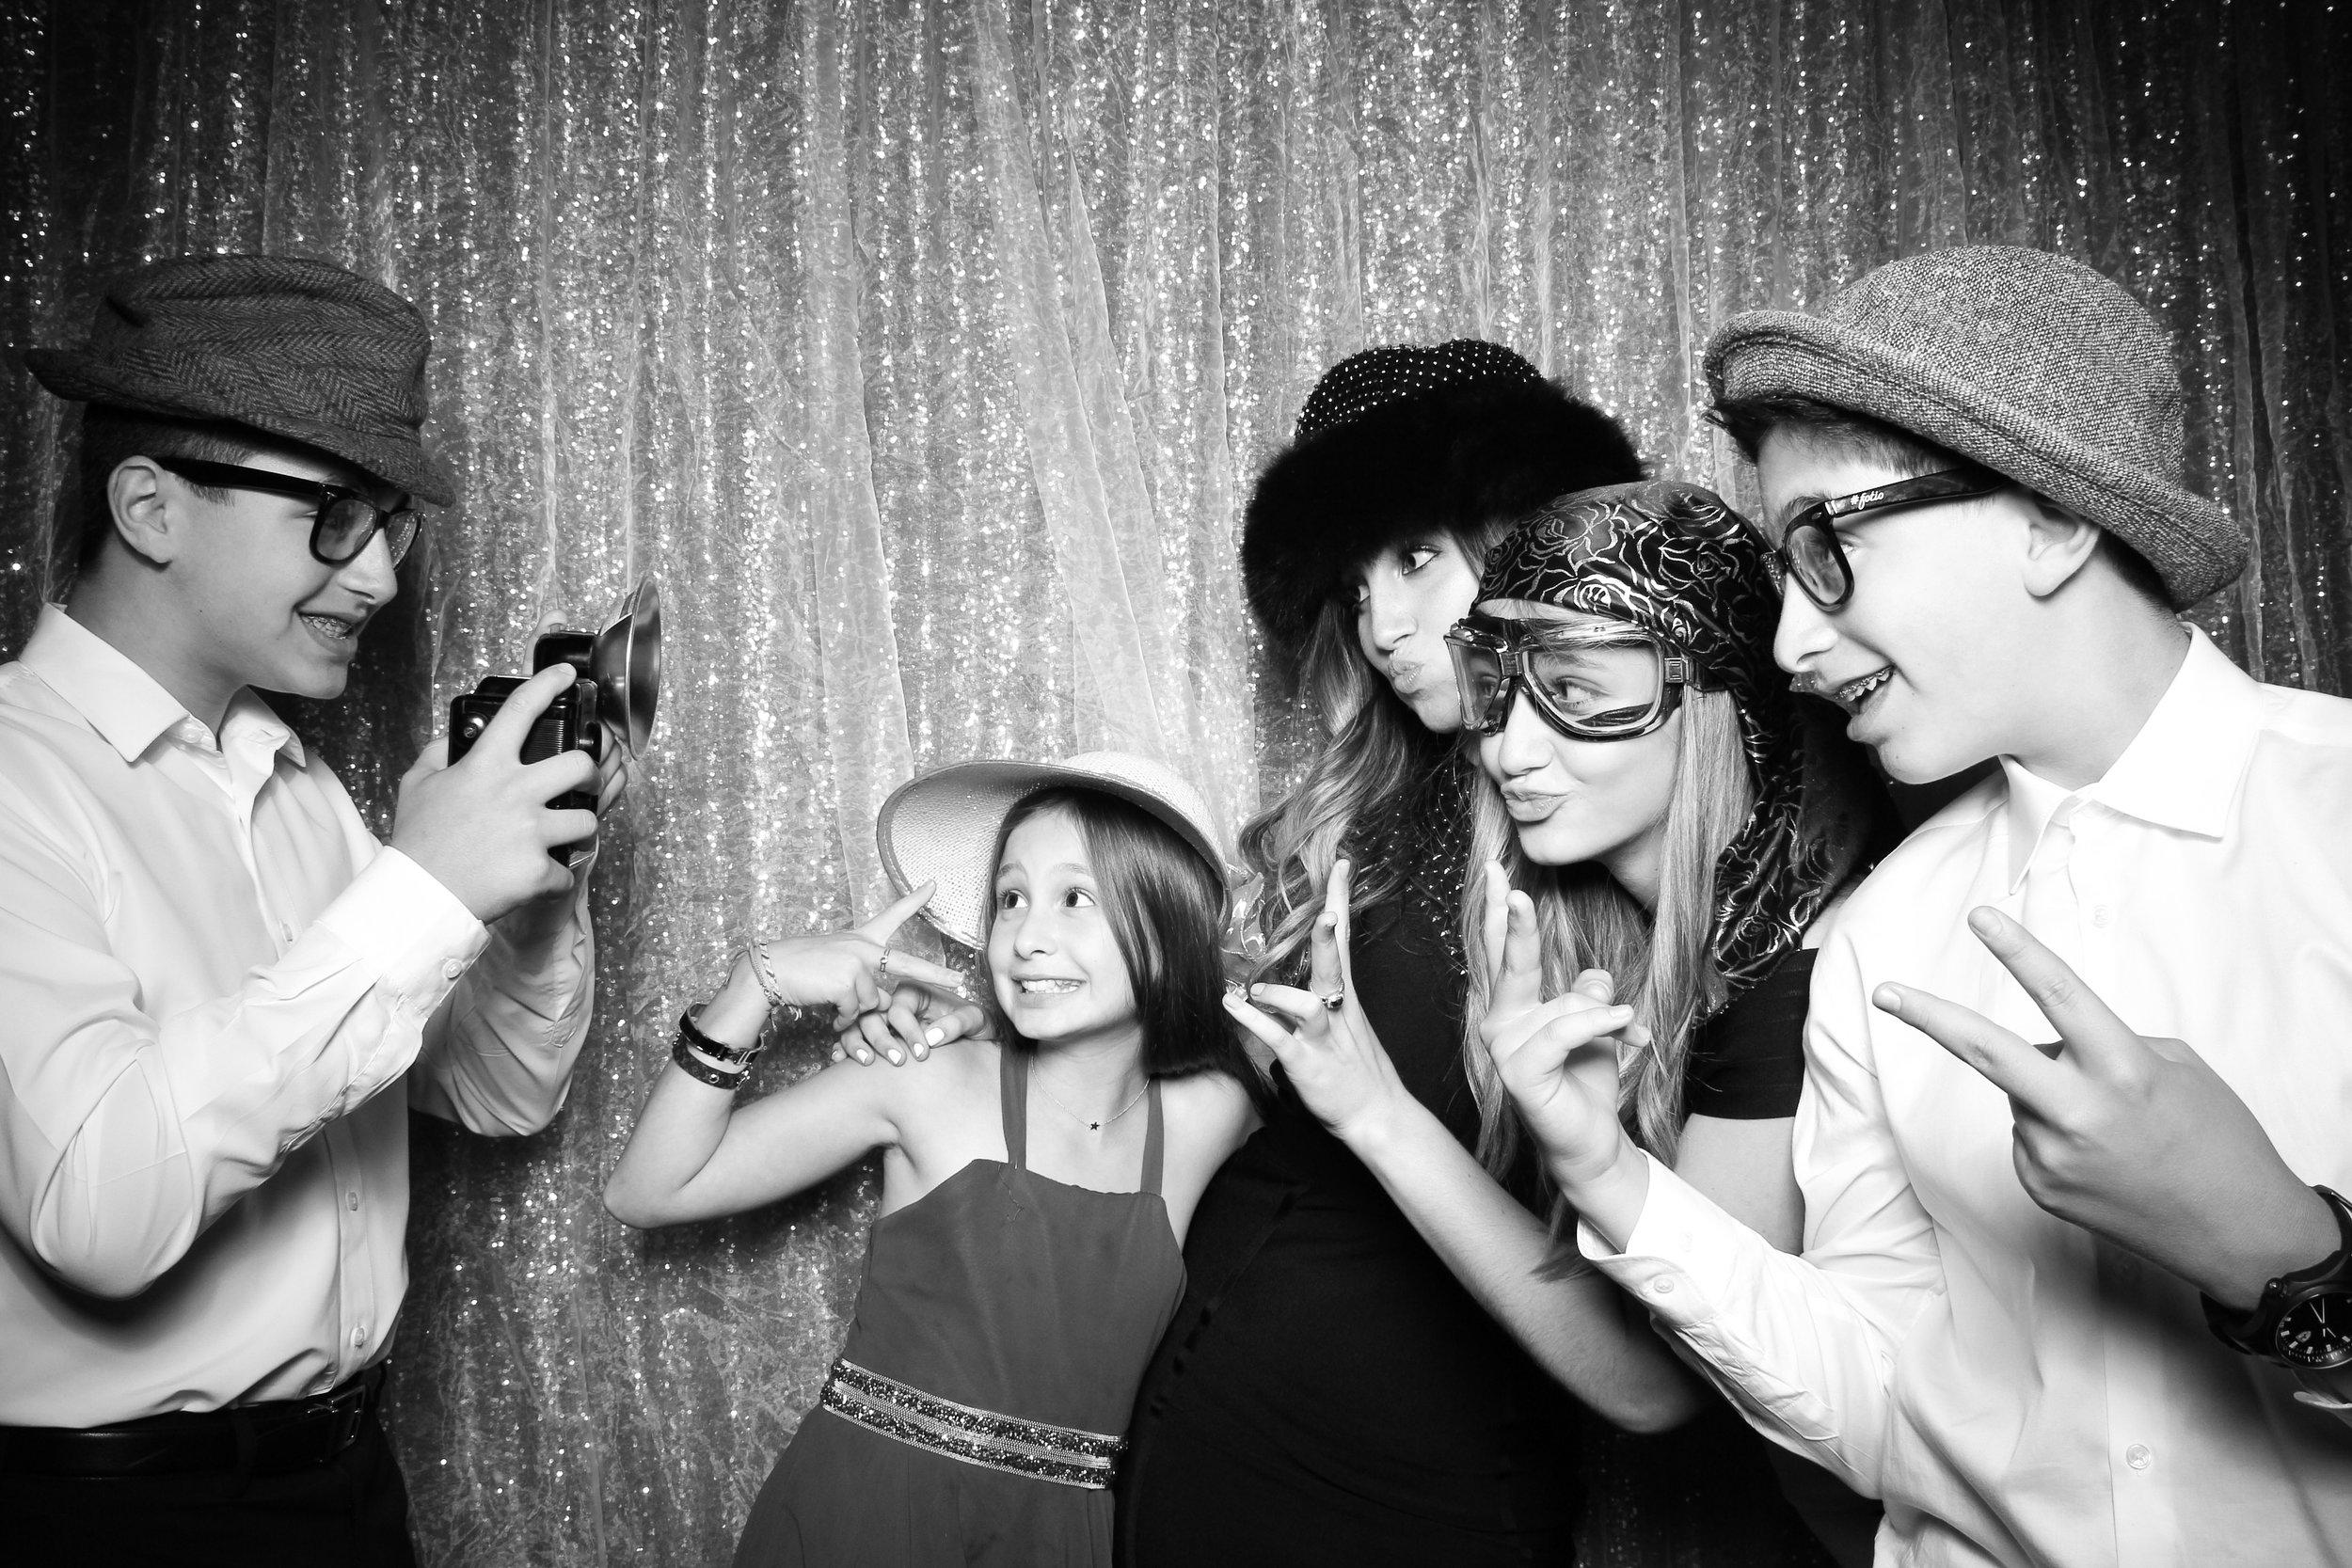 JW_Marriott_Burnham_Ballroom_Wedding_Photo_Booth_05.jpg